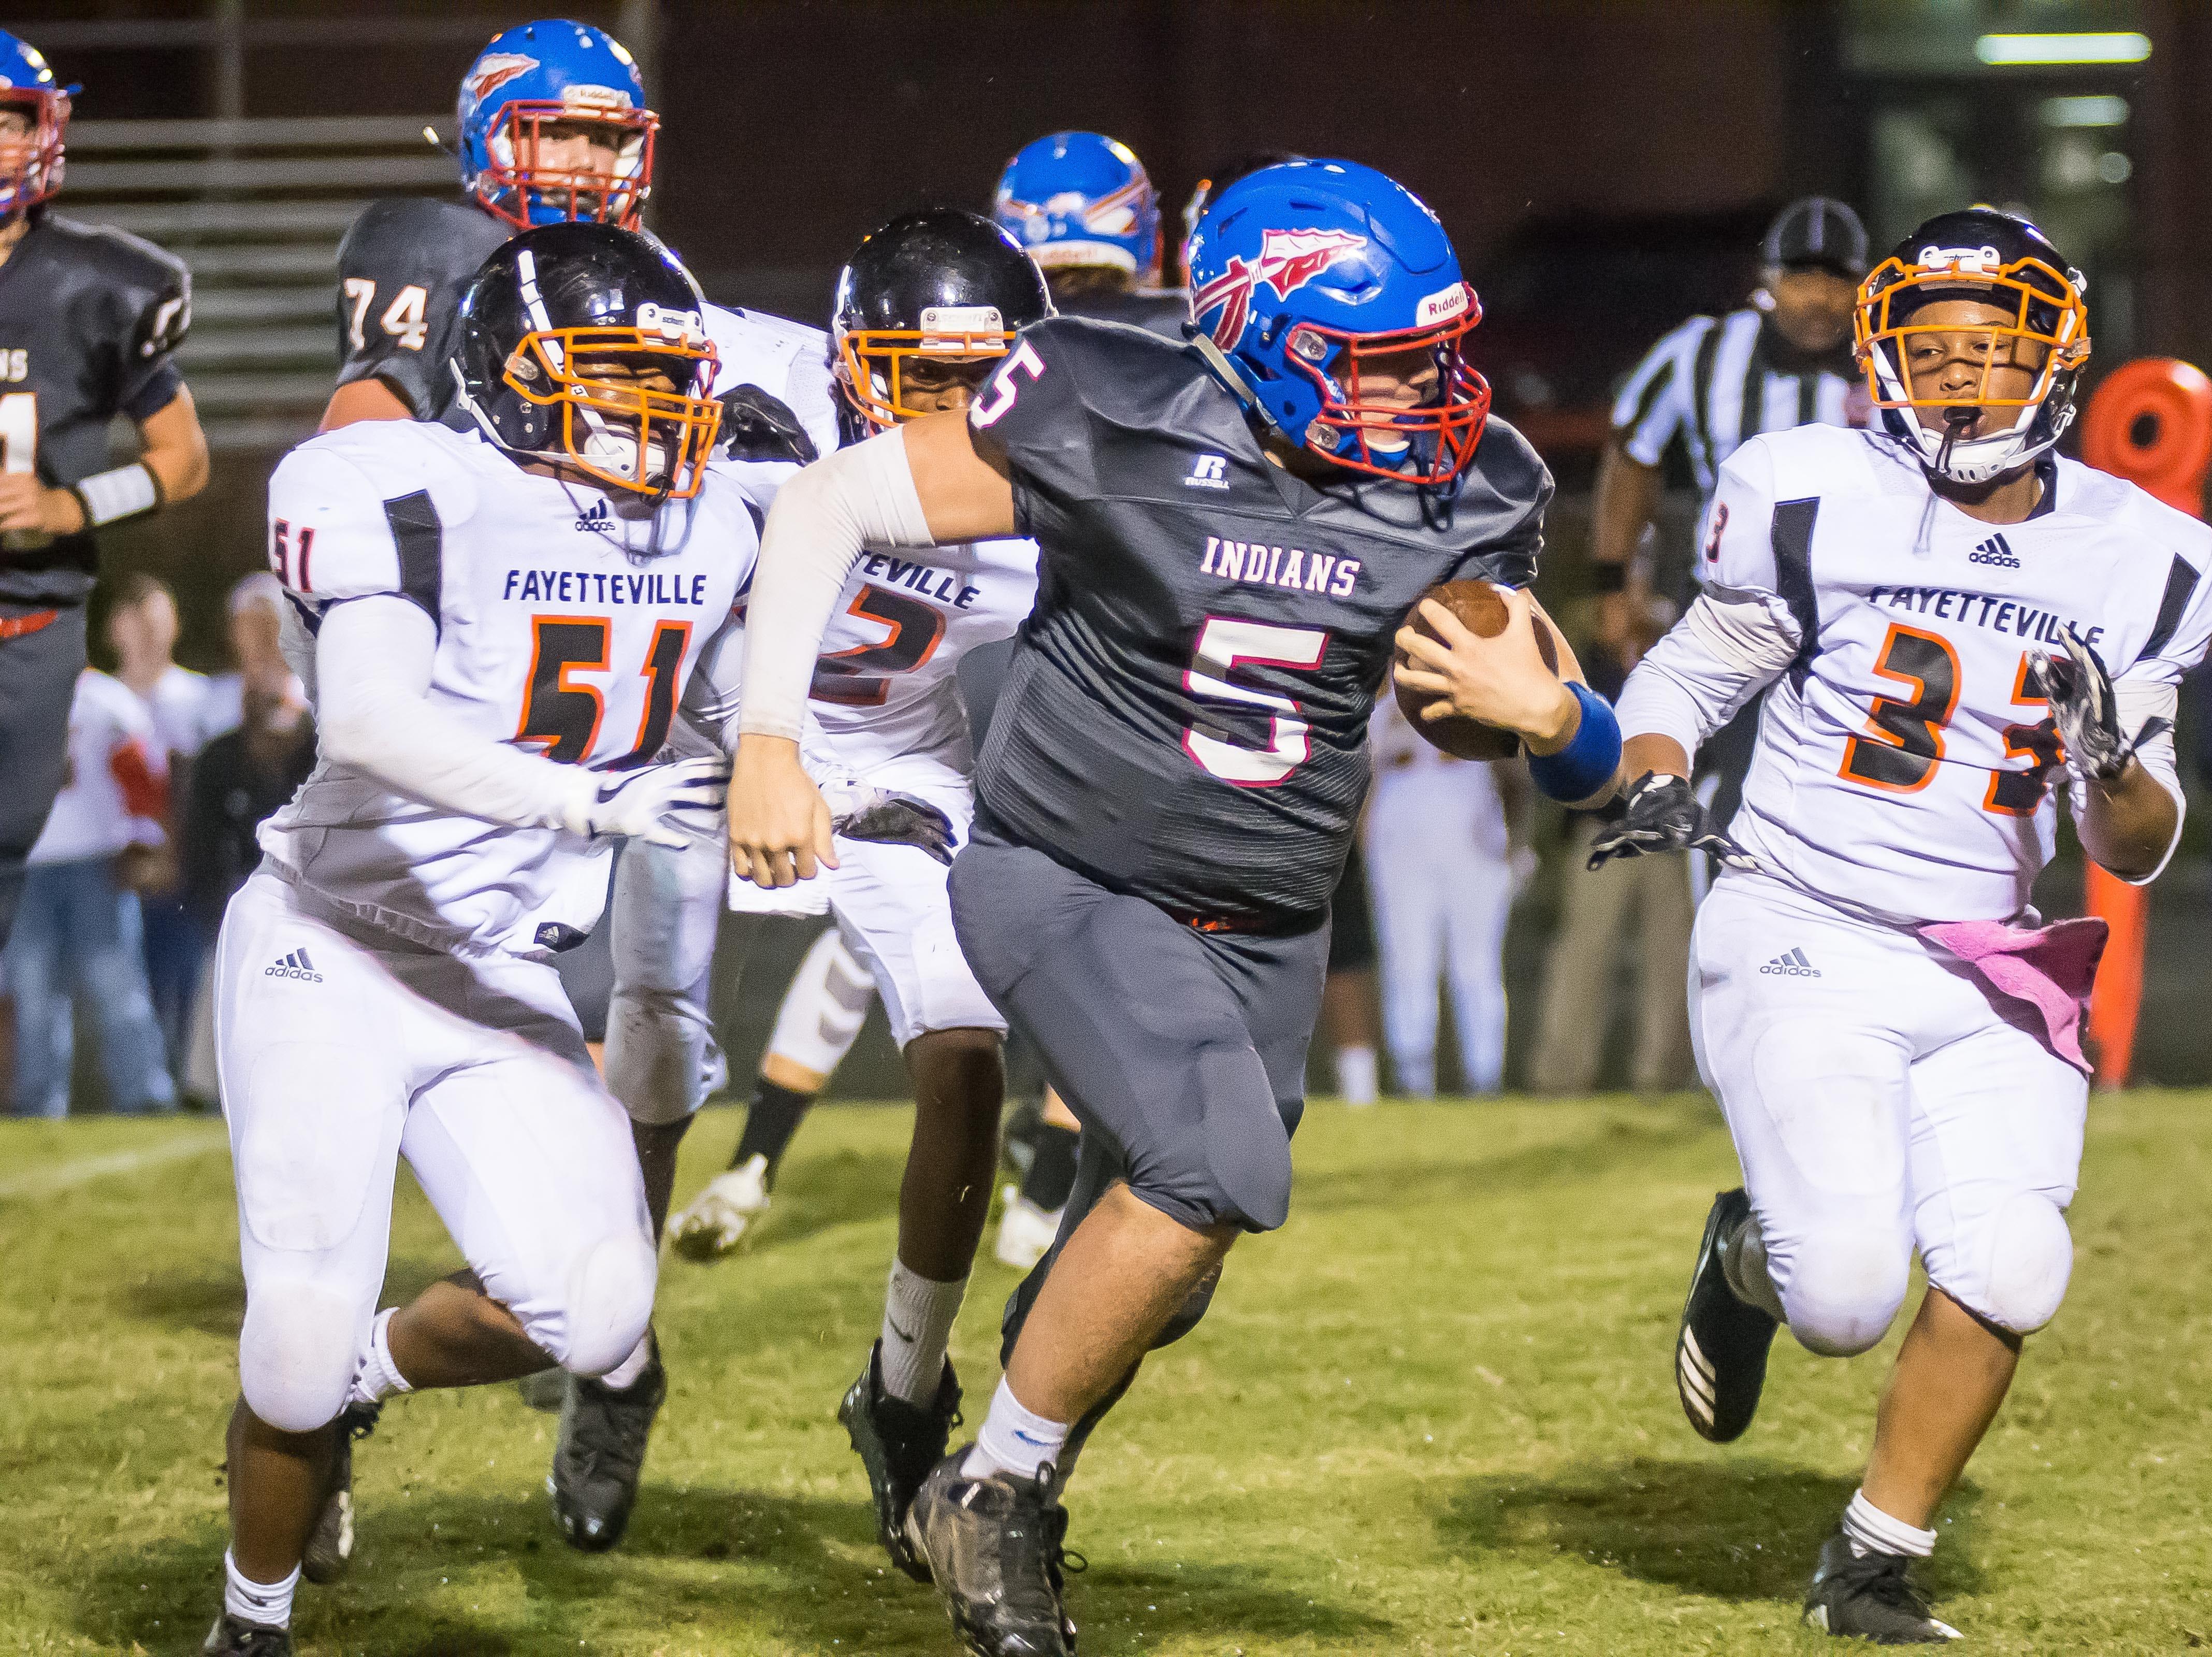 Harpeth quarterback Thomas Sloan on the run.